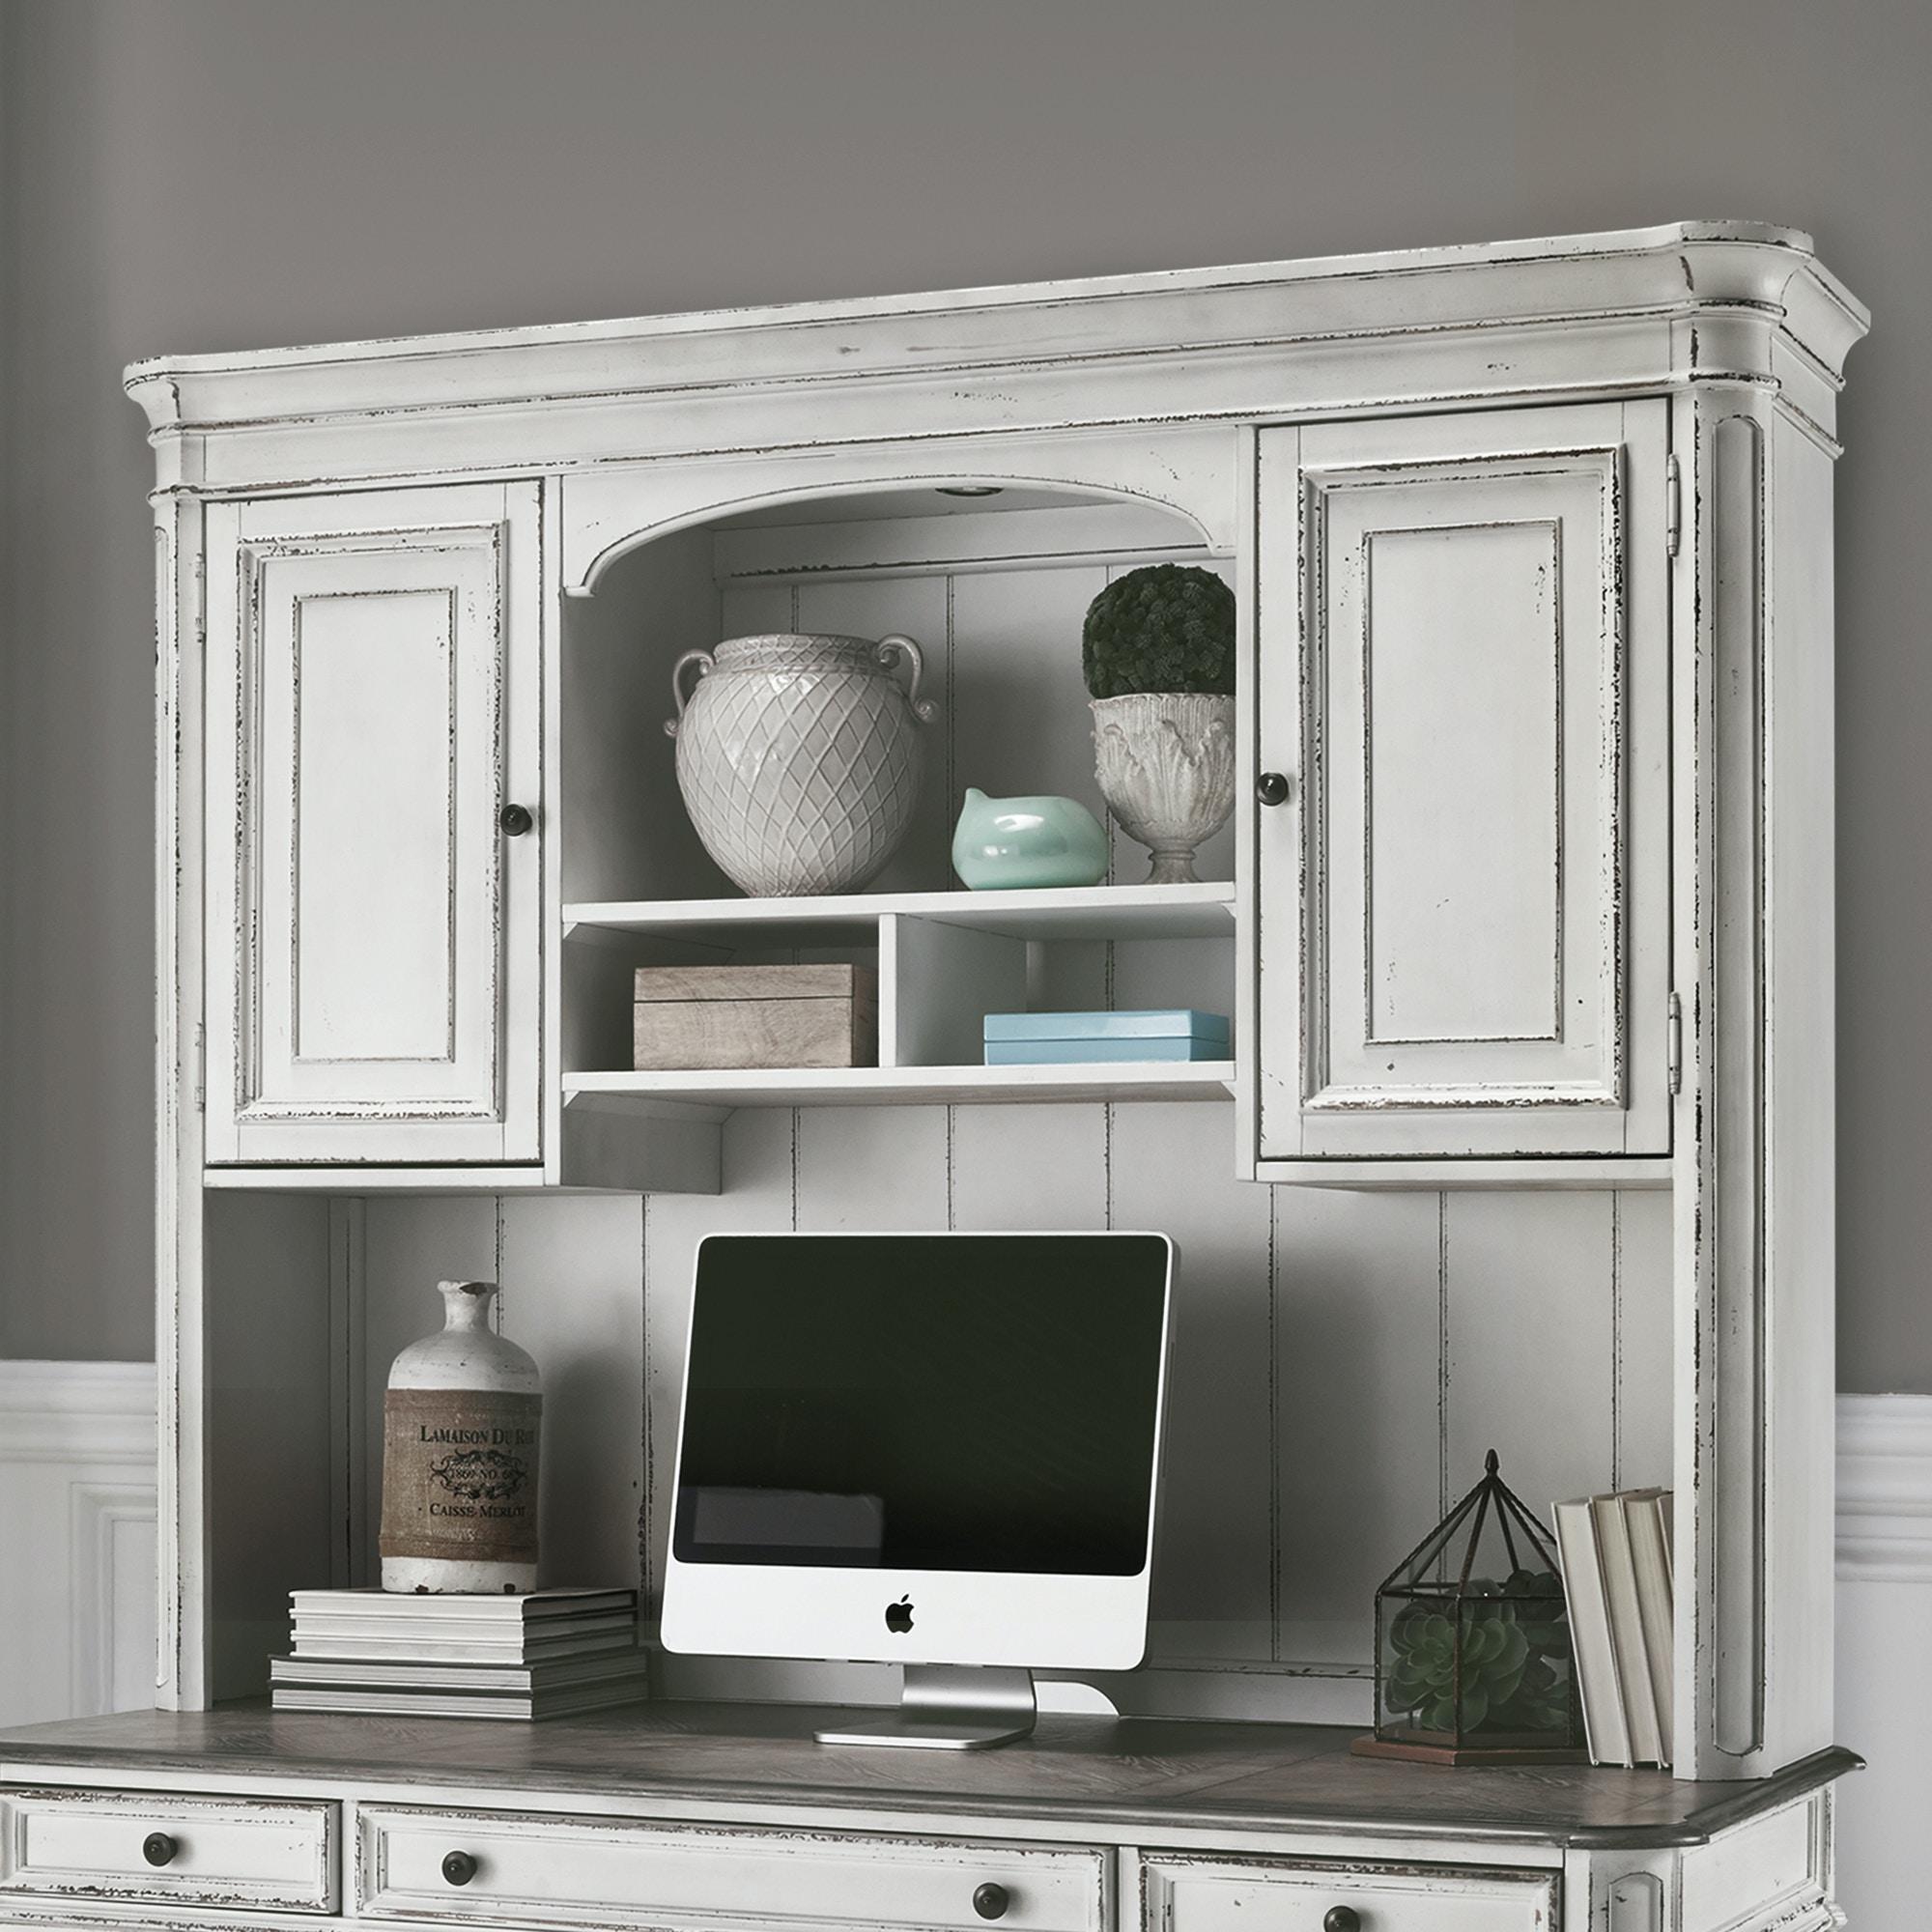 Liberty Furniture Home Office Jr Executive Credenza Hutch 244 Ho132 Wenz Home Furniture Green,Queen Elizabeth Corgis 2020